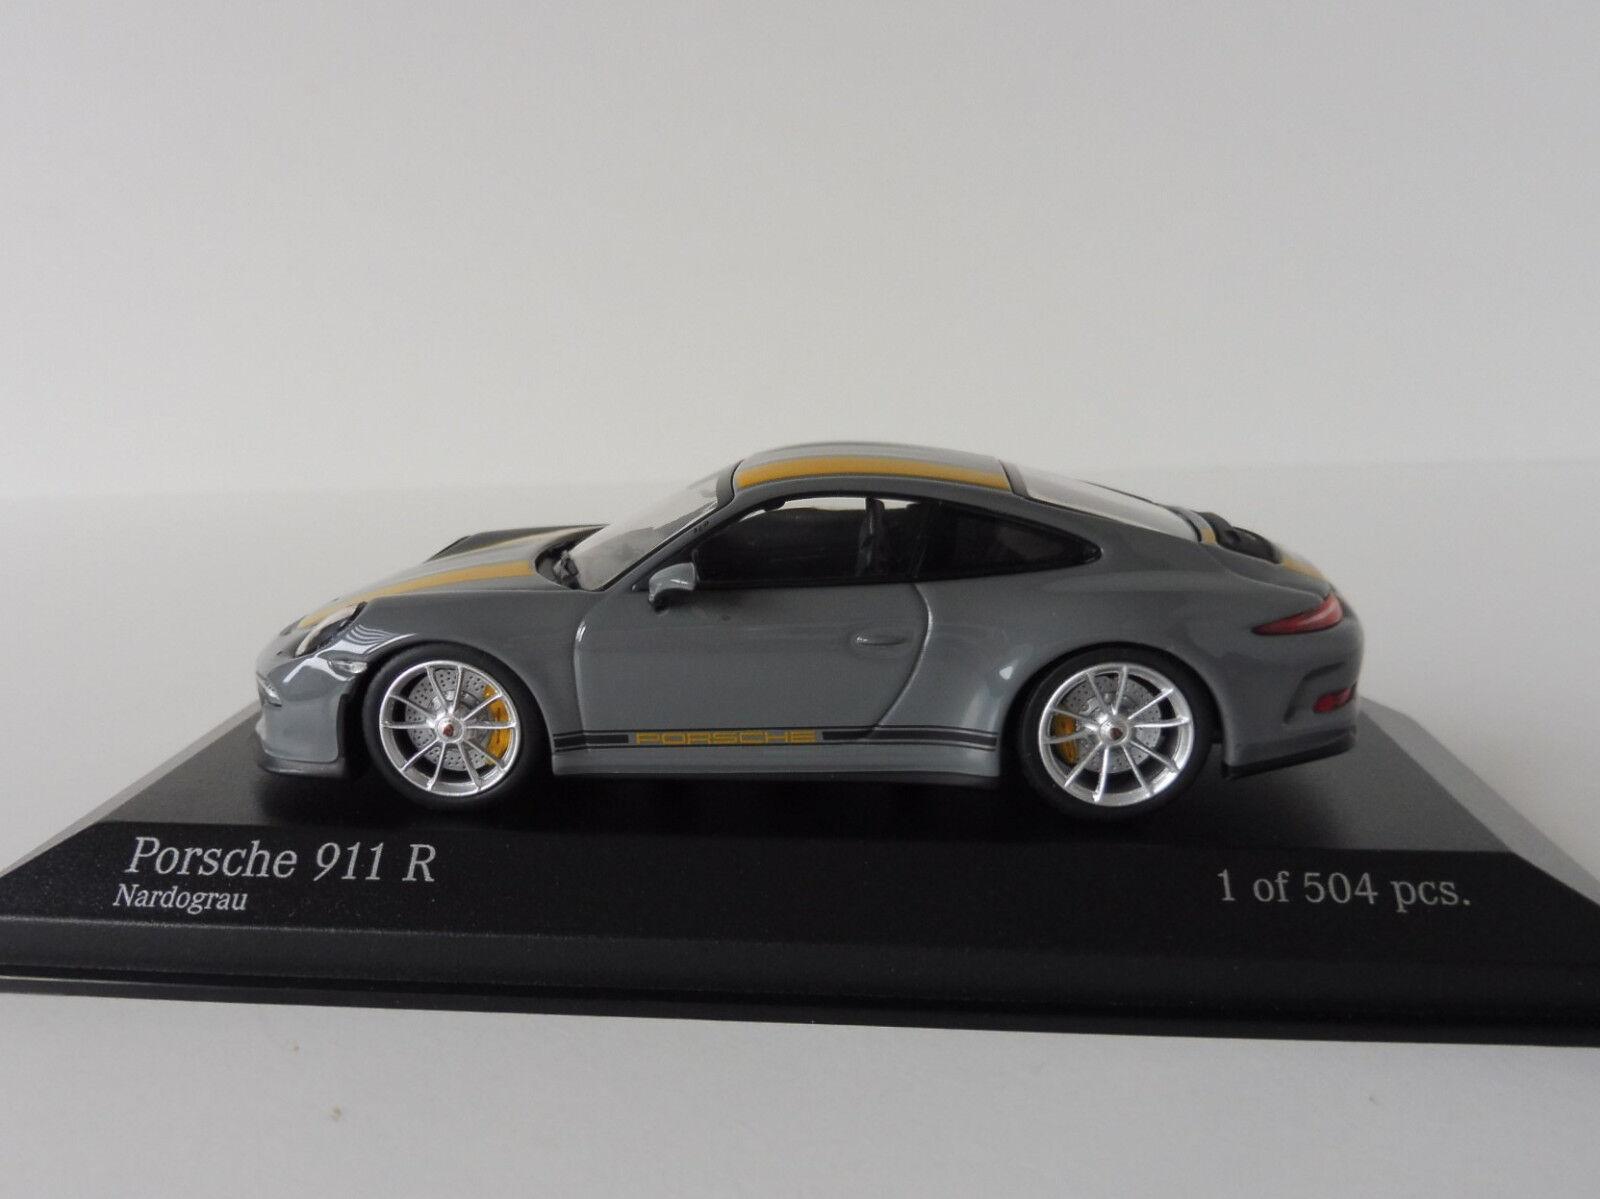 Porsche 911 R 2016 2016 2016 1 43 Minichamps 410066232 991 NARDOGREY YELLOW 504pcs. 7679a1